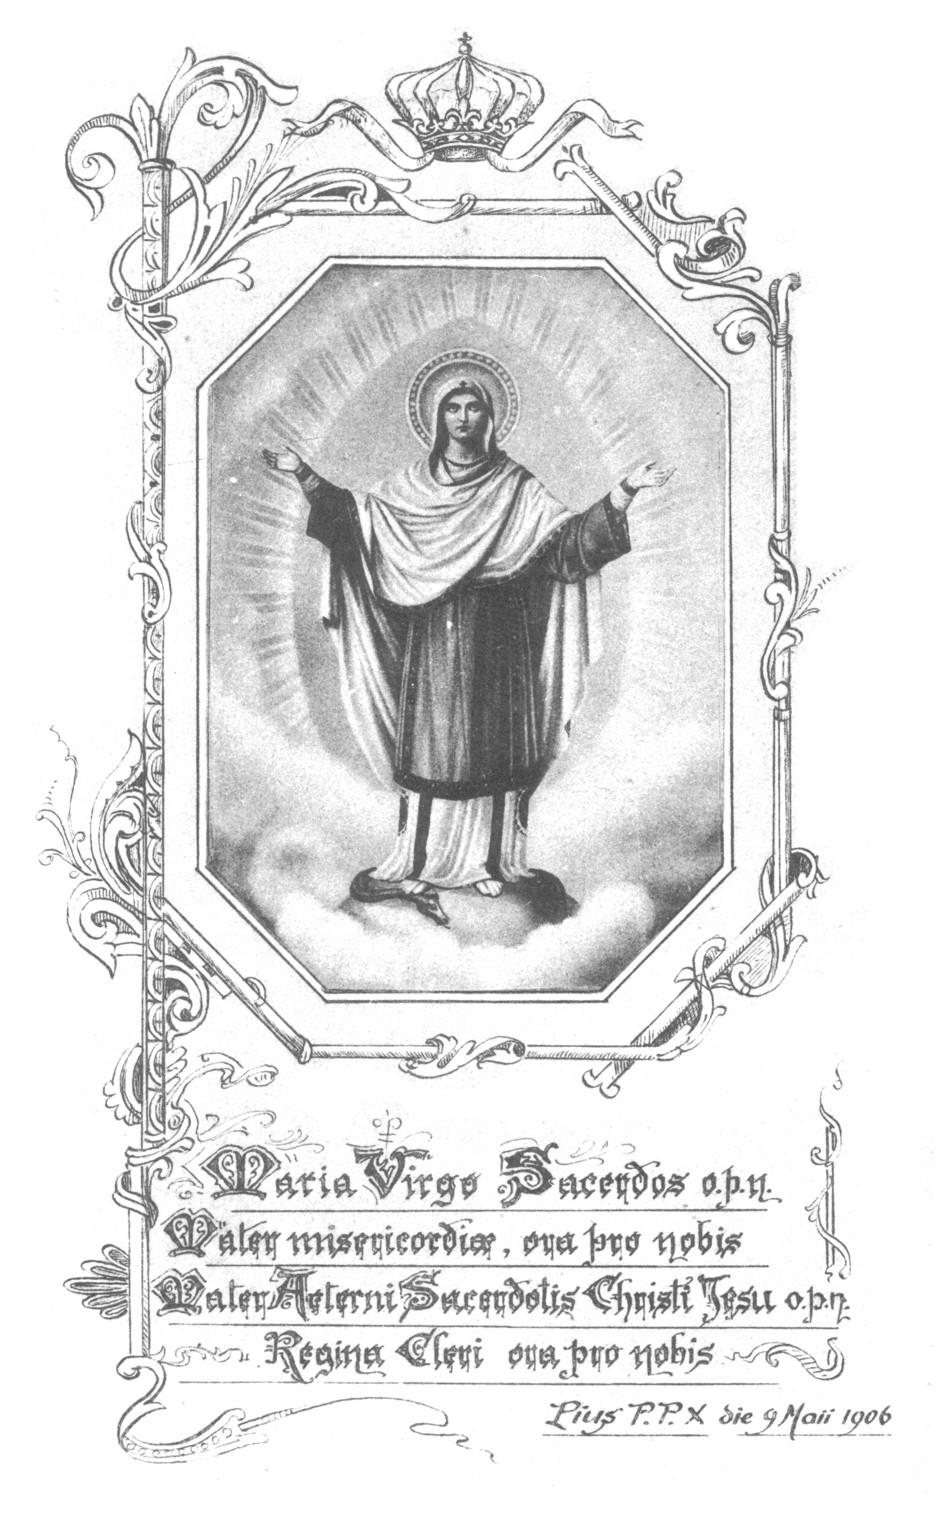 Maria Virgo Sacerdos